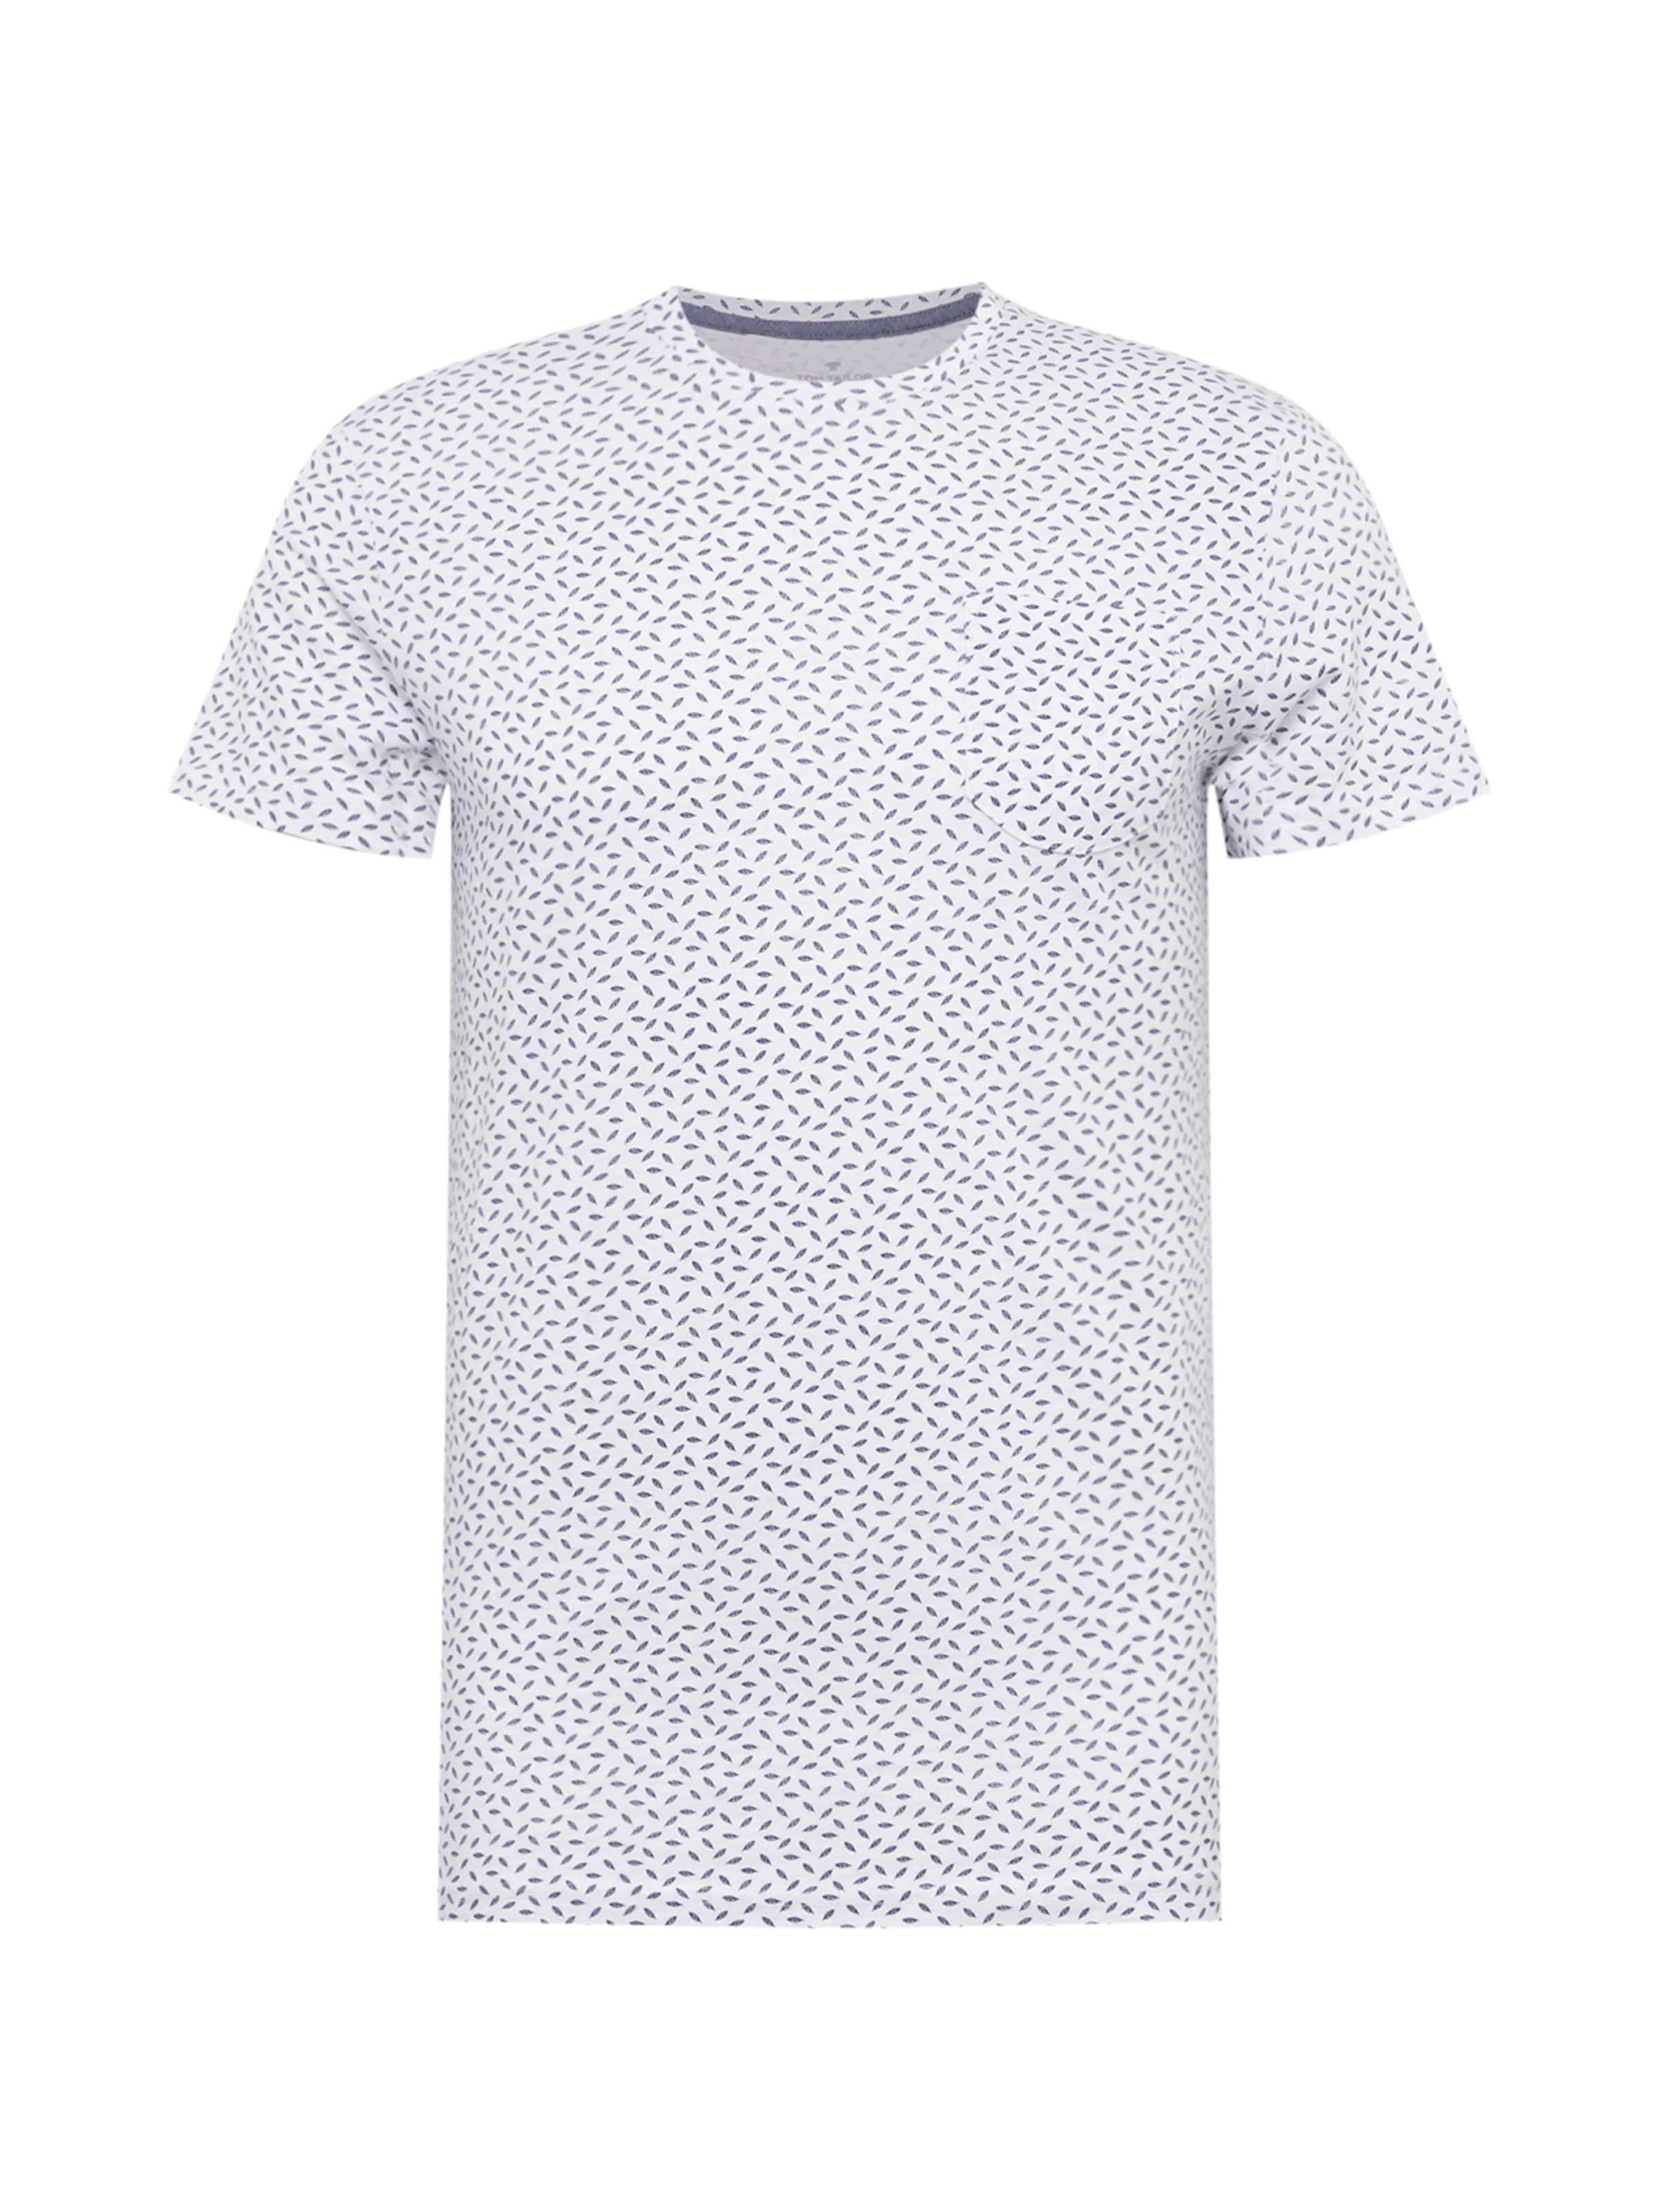 Tom TailorT shirt shirt Blanc TailorT In Tom Tom Blanc TailorT shirt In WDH9Ye2EI